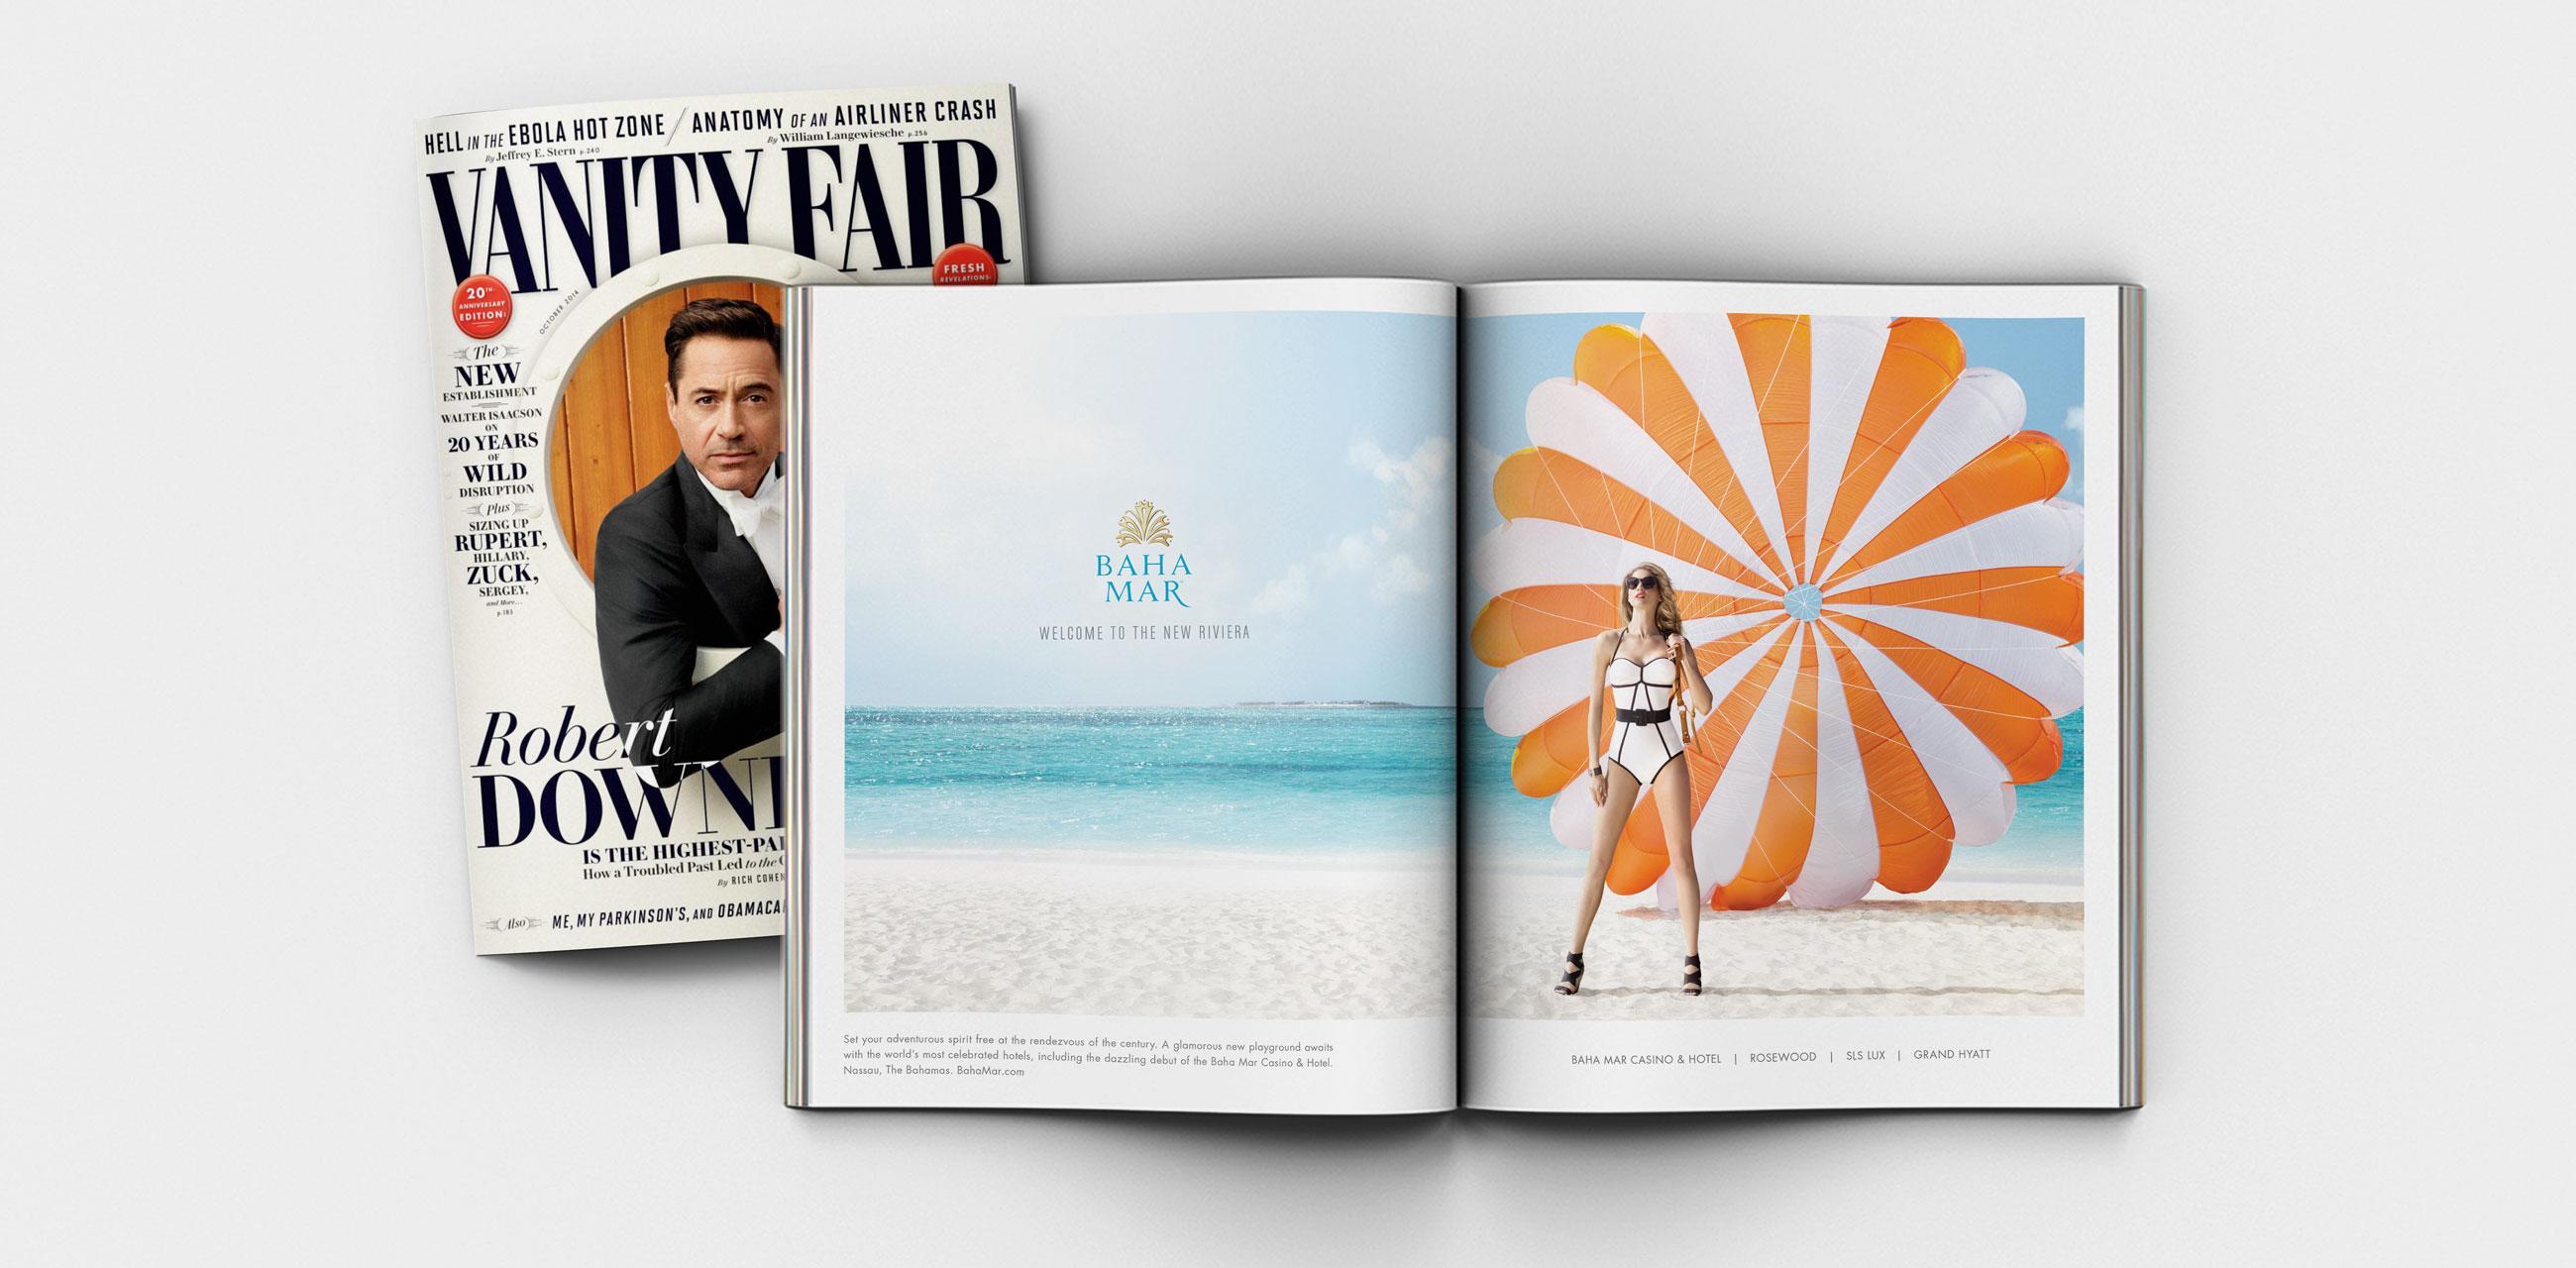 Vanity Fair Magazine spread